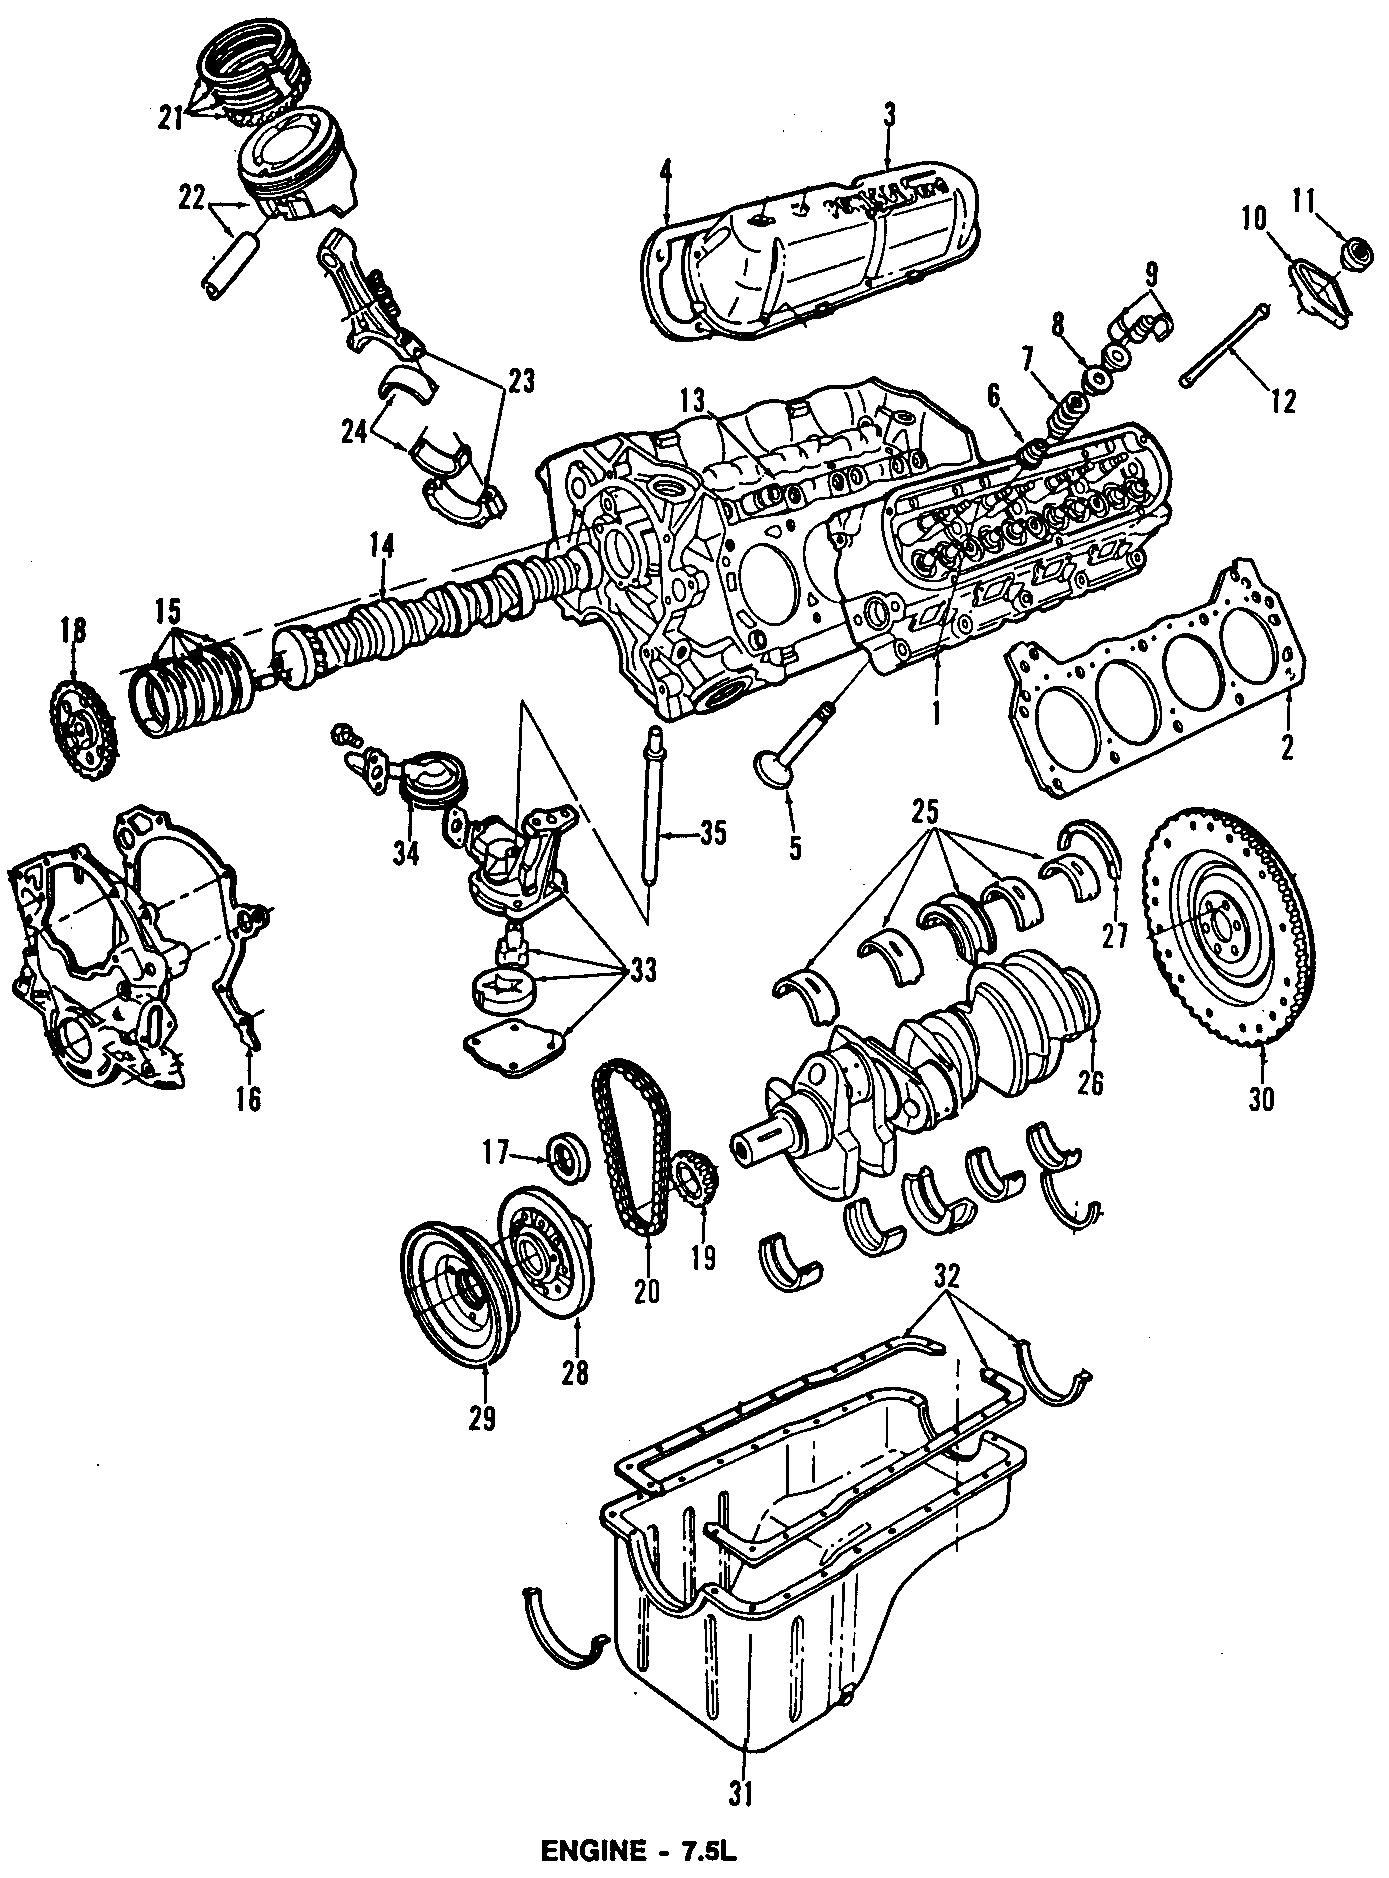 1996 Ford F-350 Engine Crankshaft Pulley. Engine